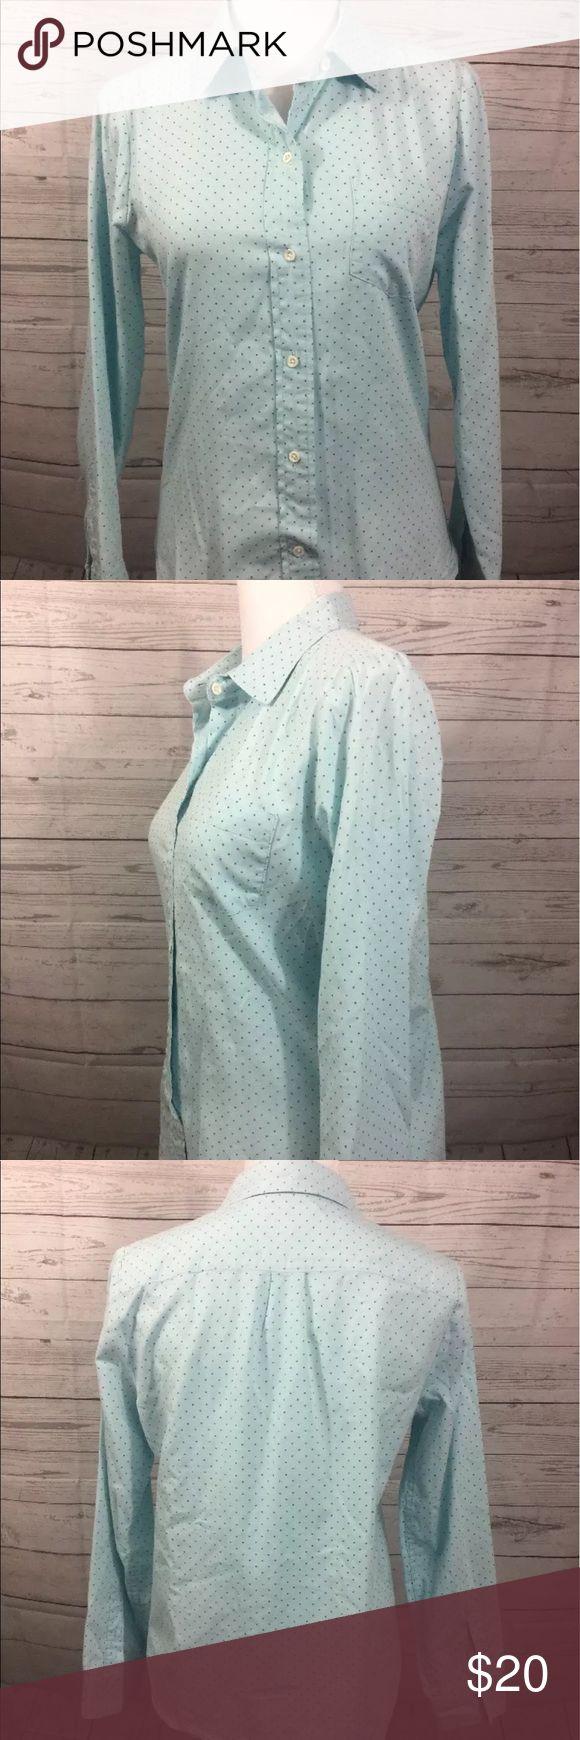 "J.Crew Shrunken Shirt in Dot Oxford J.Crew Shrunken Shirt in Dot Oxford Womens 6  Color: Green and Blue Pattern: Polka Dot   100% Cotton   Measurements Approximate: Shoulder to Shoulder - 14.5"" Armpit to Armpit - 19.5"" Sleeve Length -22.5"" Shirt Length - 24"" J. Crew Tops Button Down Shirts"